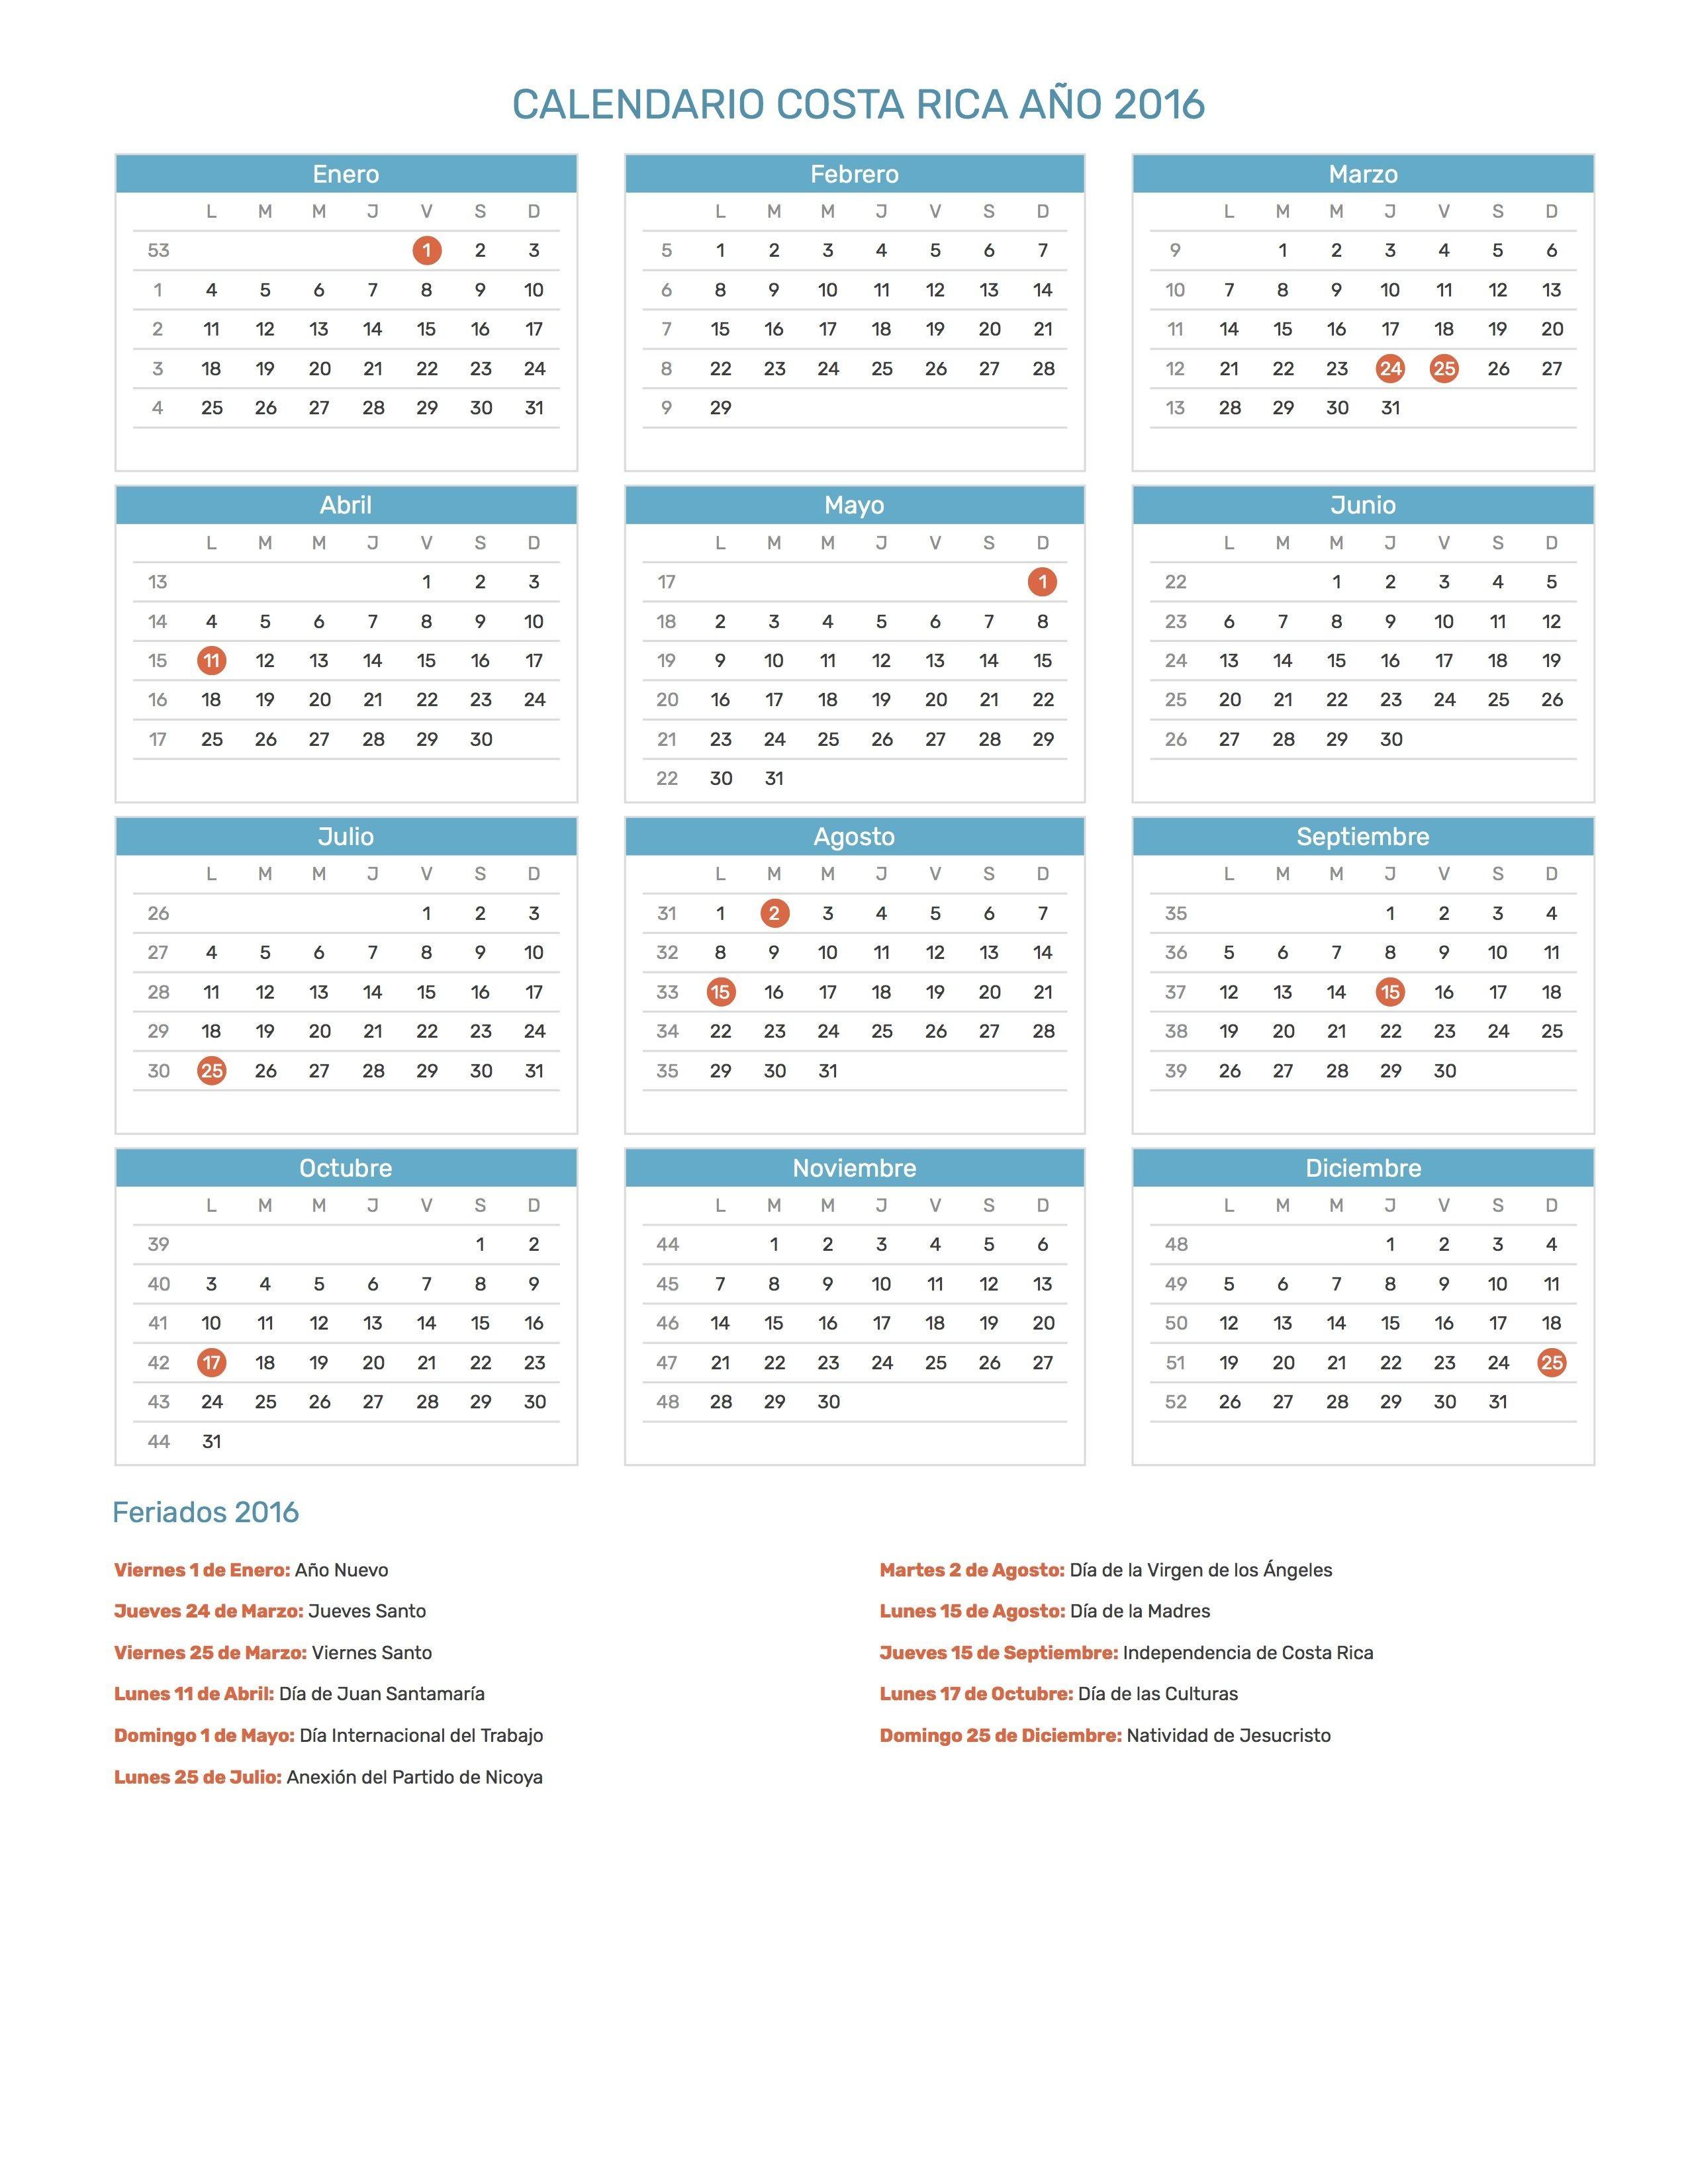 Calendario Septiembre 2019 Para Imprimir Mexico Más Recientes Pin De Calendario Hispano En Calendario Con Feriados A±o 2016 Of Calendario Septiembre 2019 Para Imprimir Mexico Más Arriba-a-fecha Es Decir Calendario 2019 Para Imprimir Excel